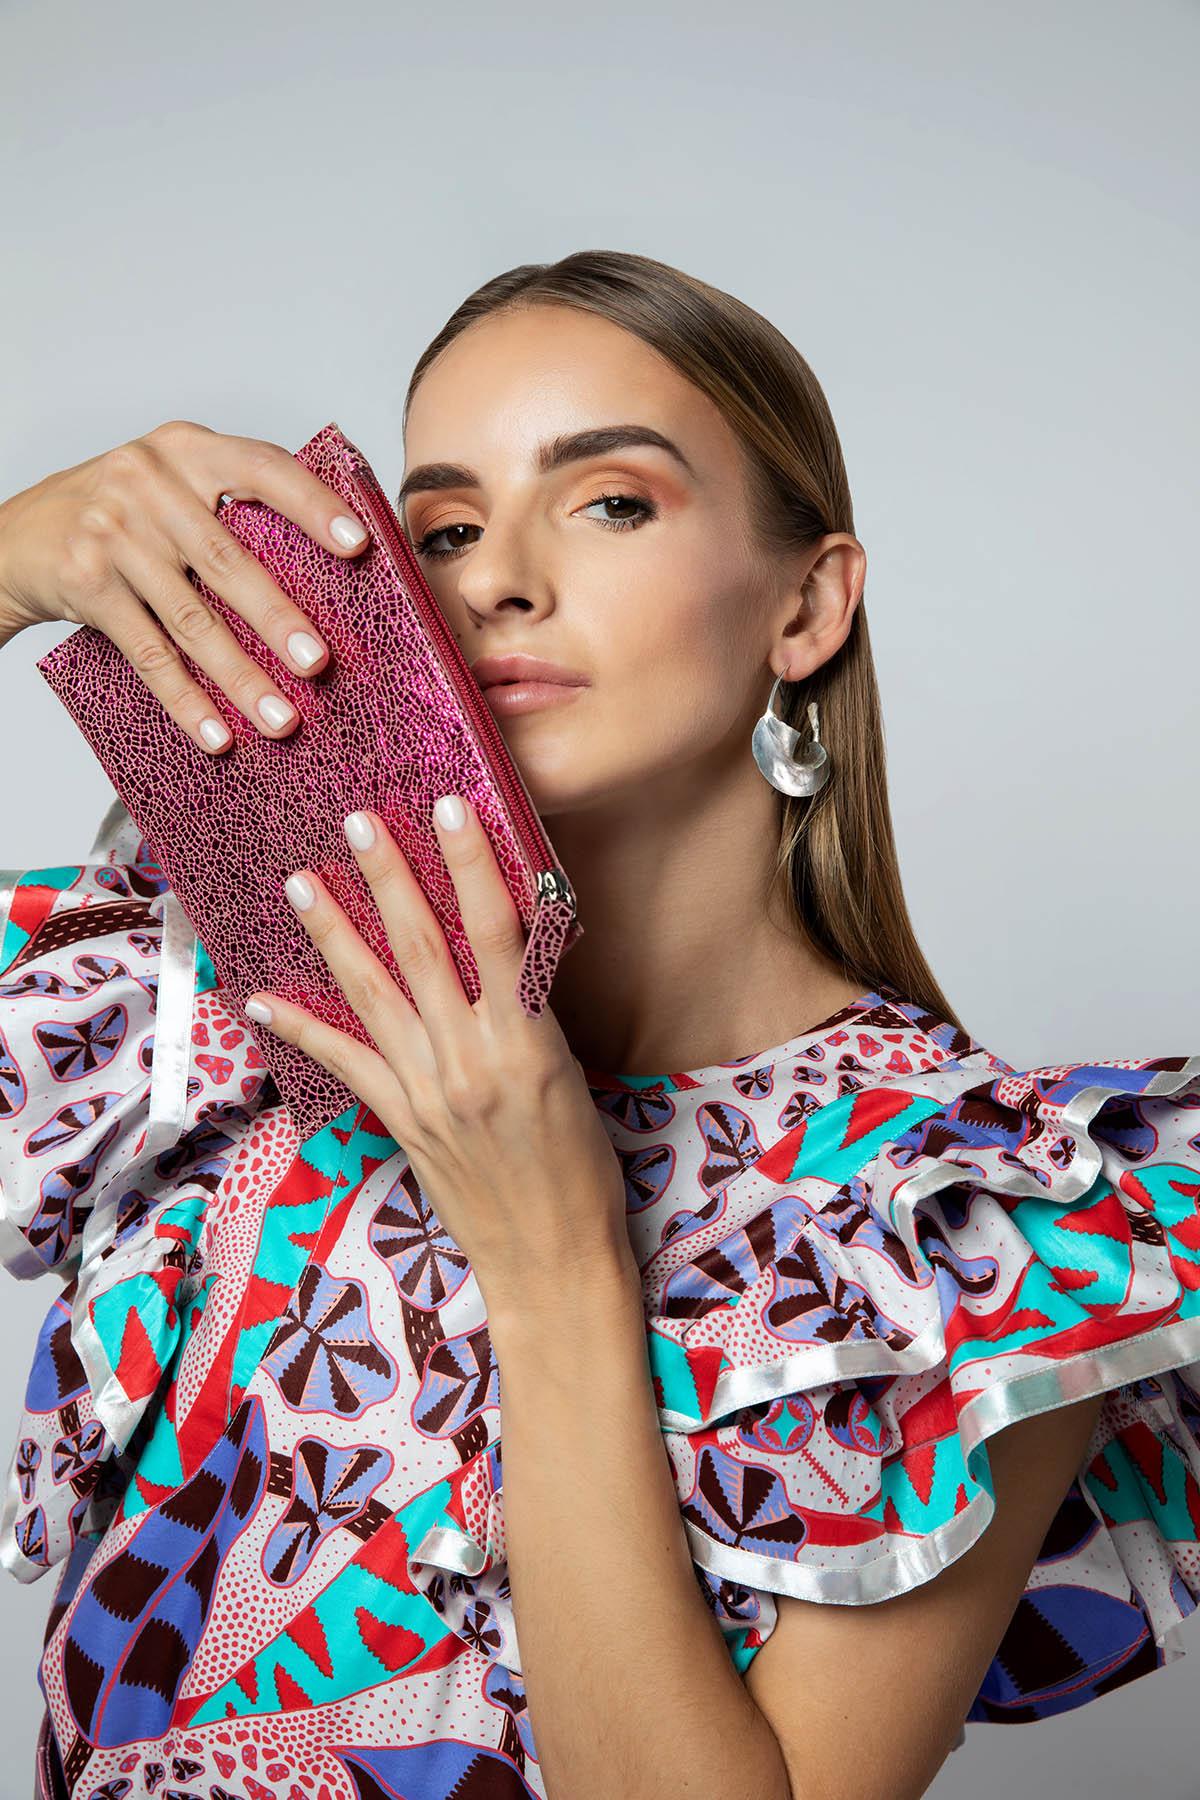 Lookbook photoshoot with Katrina by Loesje Kessels Fashion Photographer Dubai